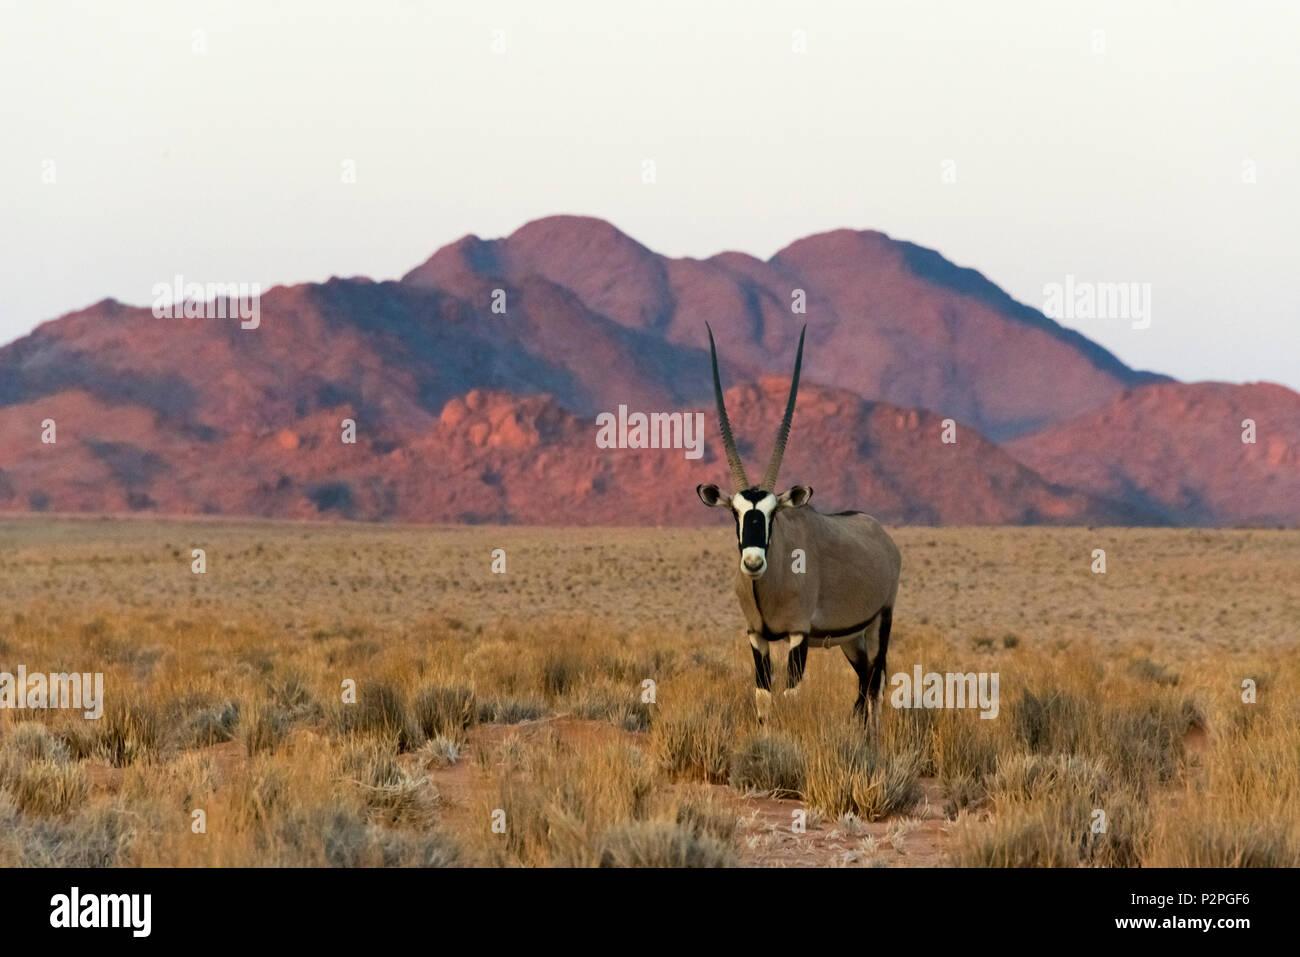 Gemsbok (Oryx gazella) dans le sud du désert du Namib, Sesriem, Namibie, région Hardap Photo Stock